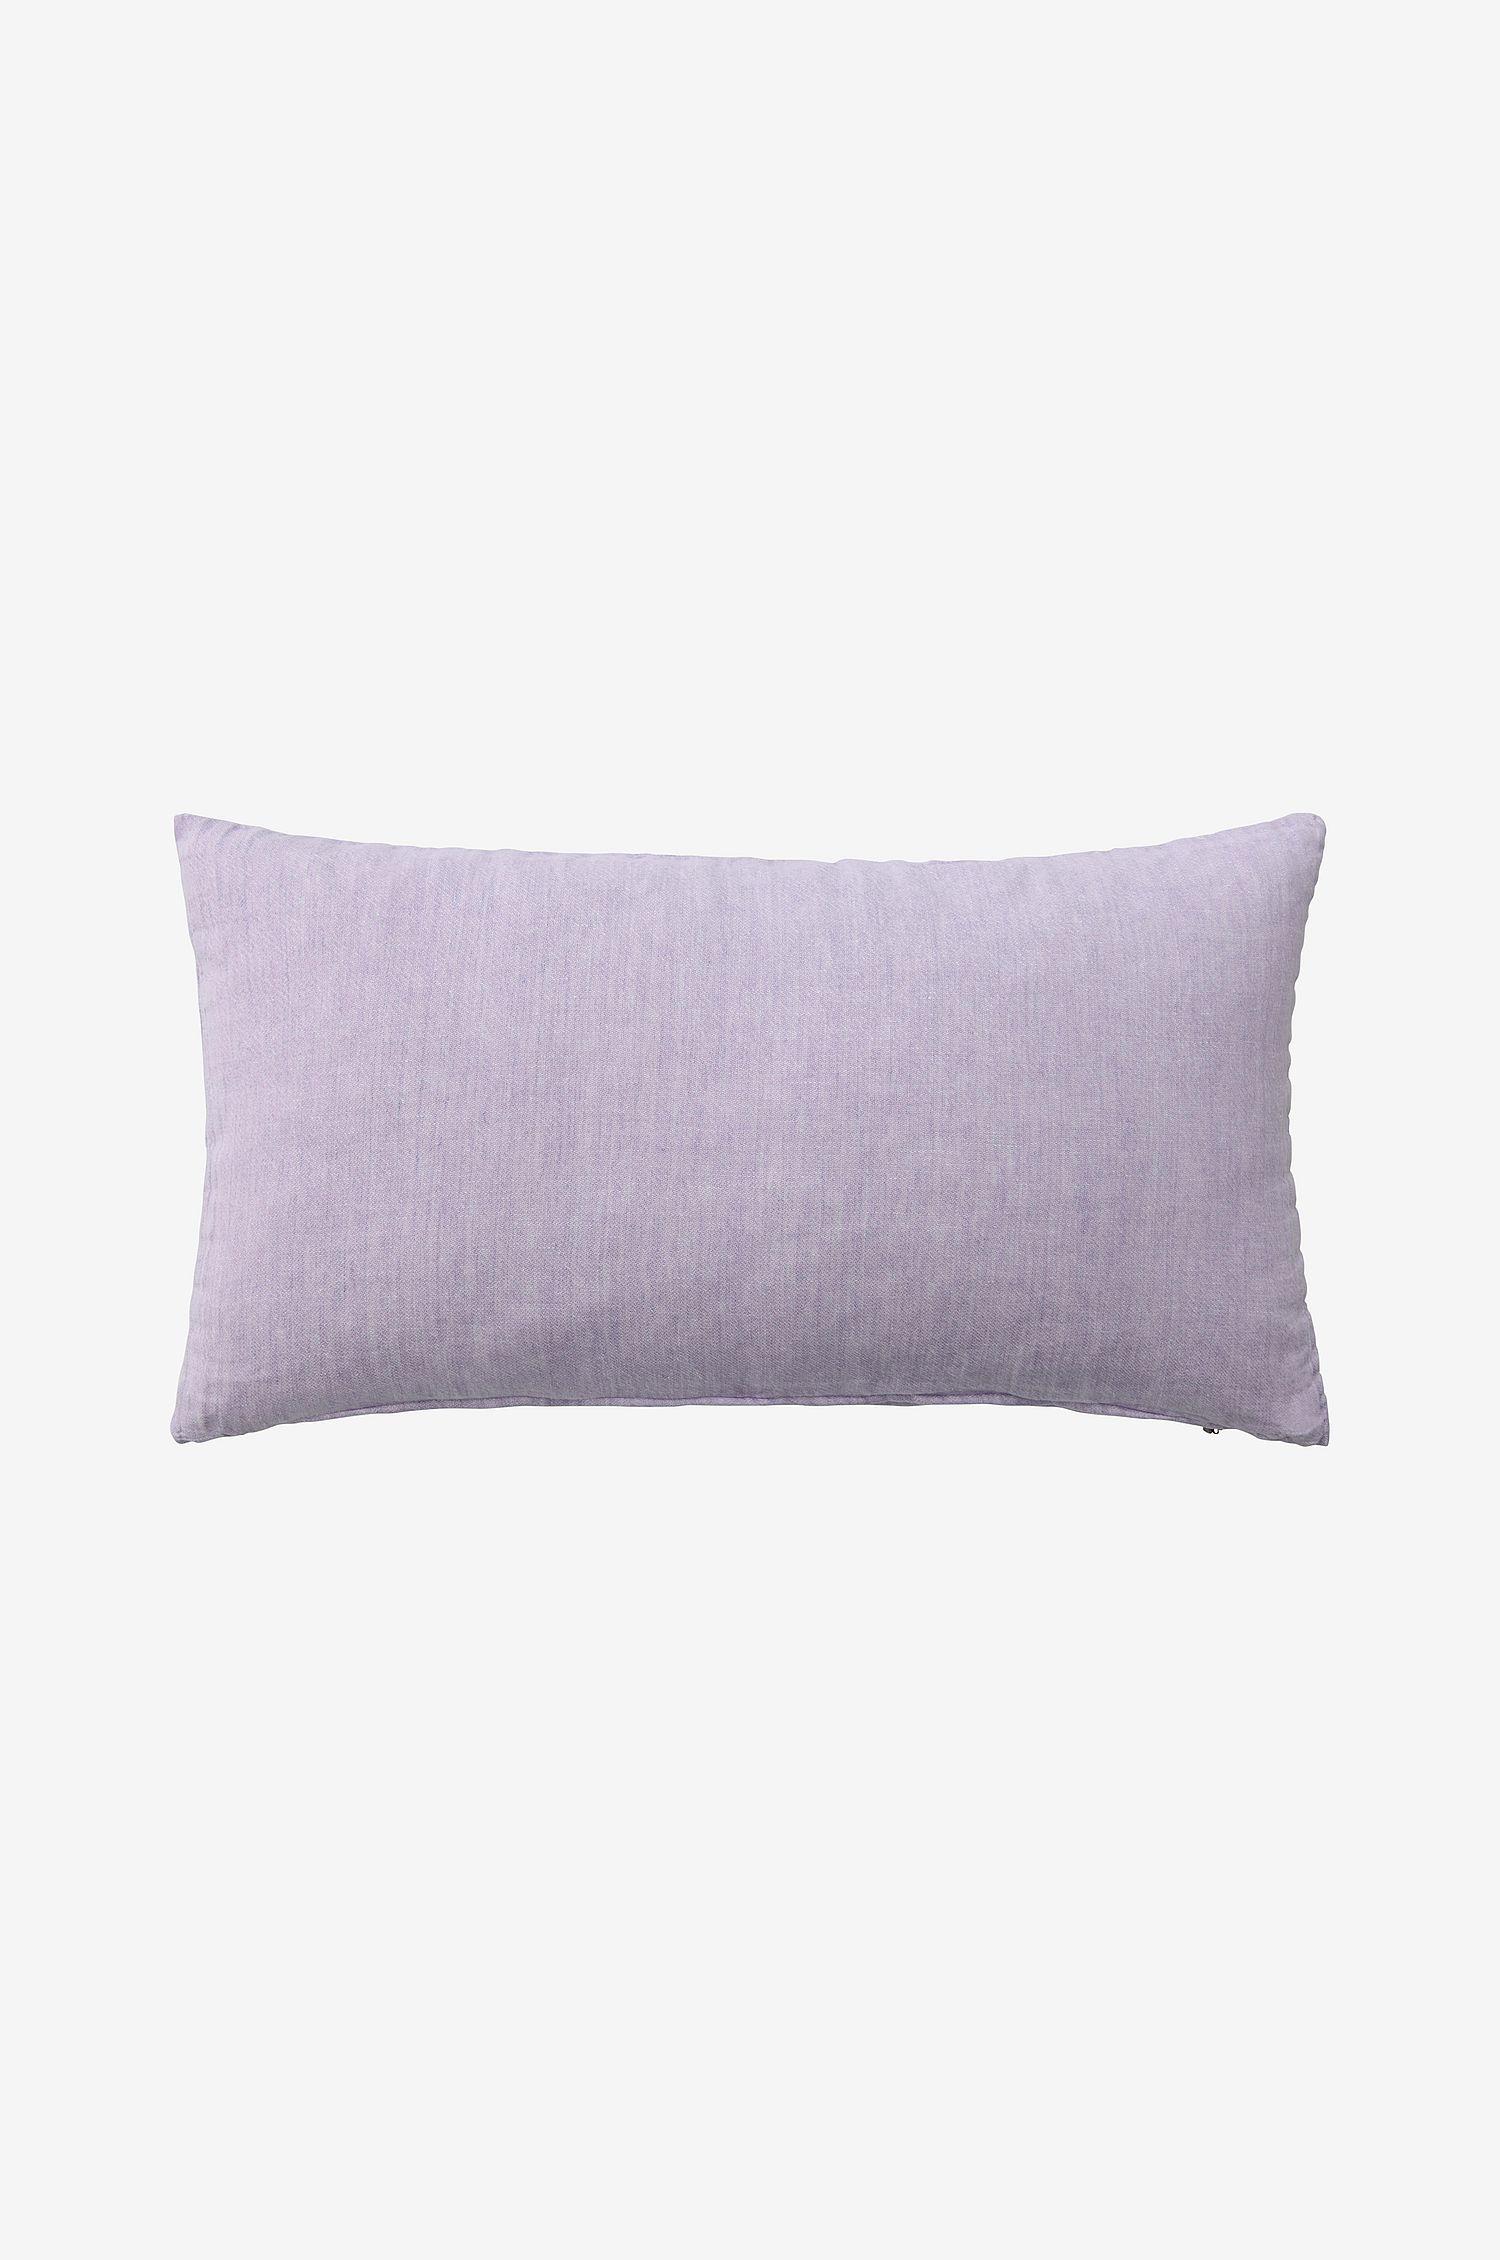 Lavendellilla pute i vasket lin